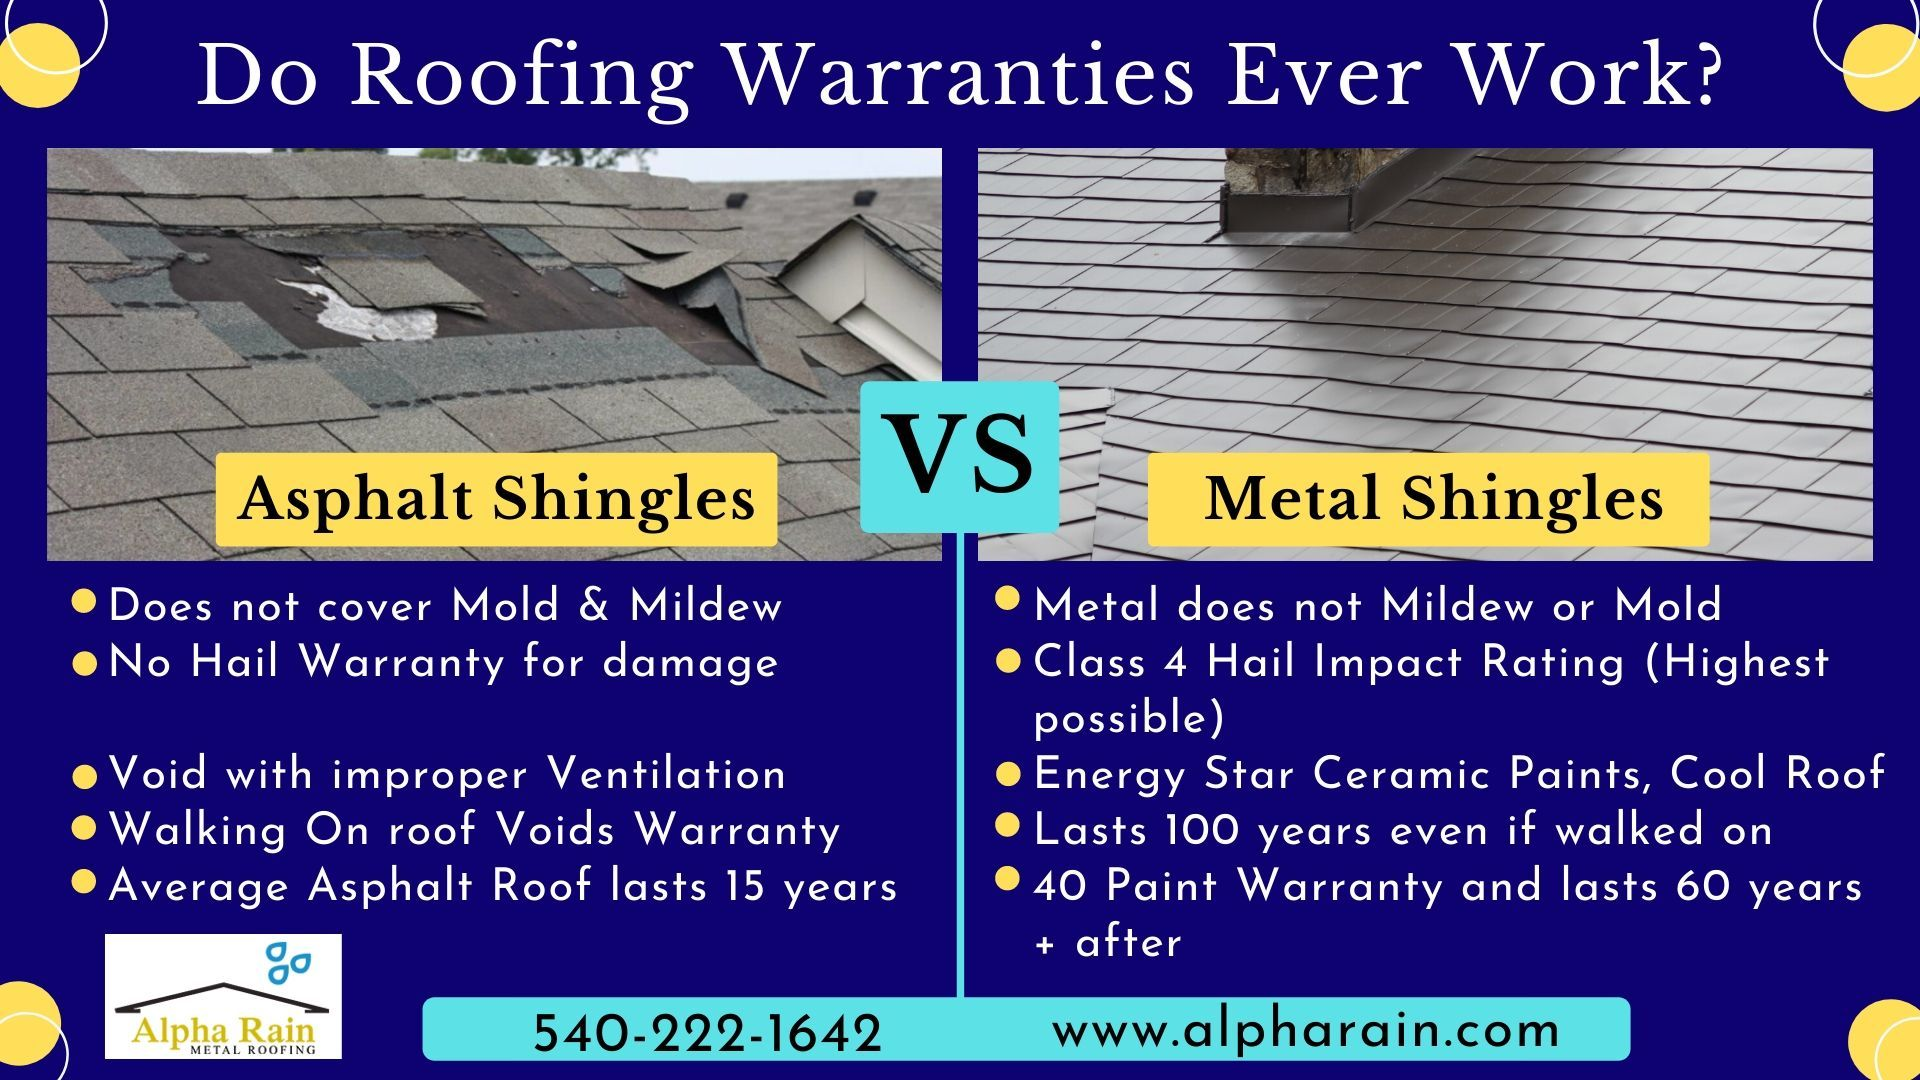 Do Asphalt Shingles Offer No Warranty For Hail Damage In 2020 Shingling Cool Roof Asphalt Roof Shingles